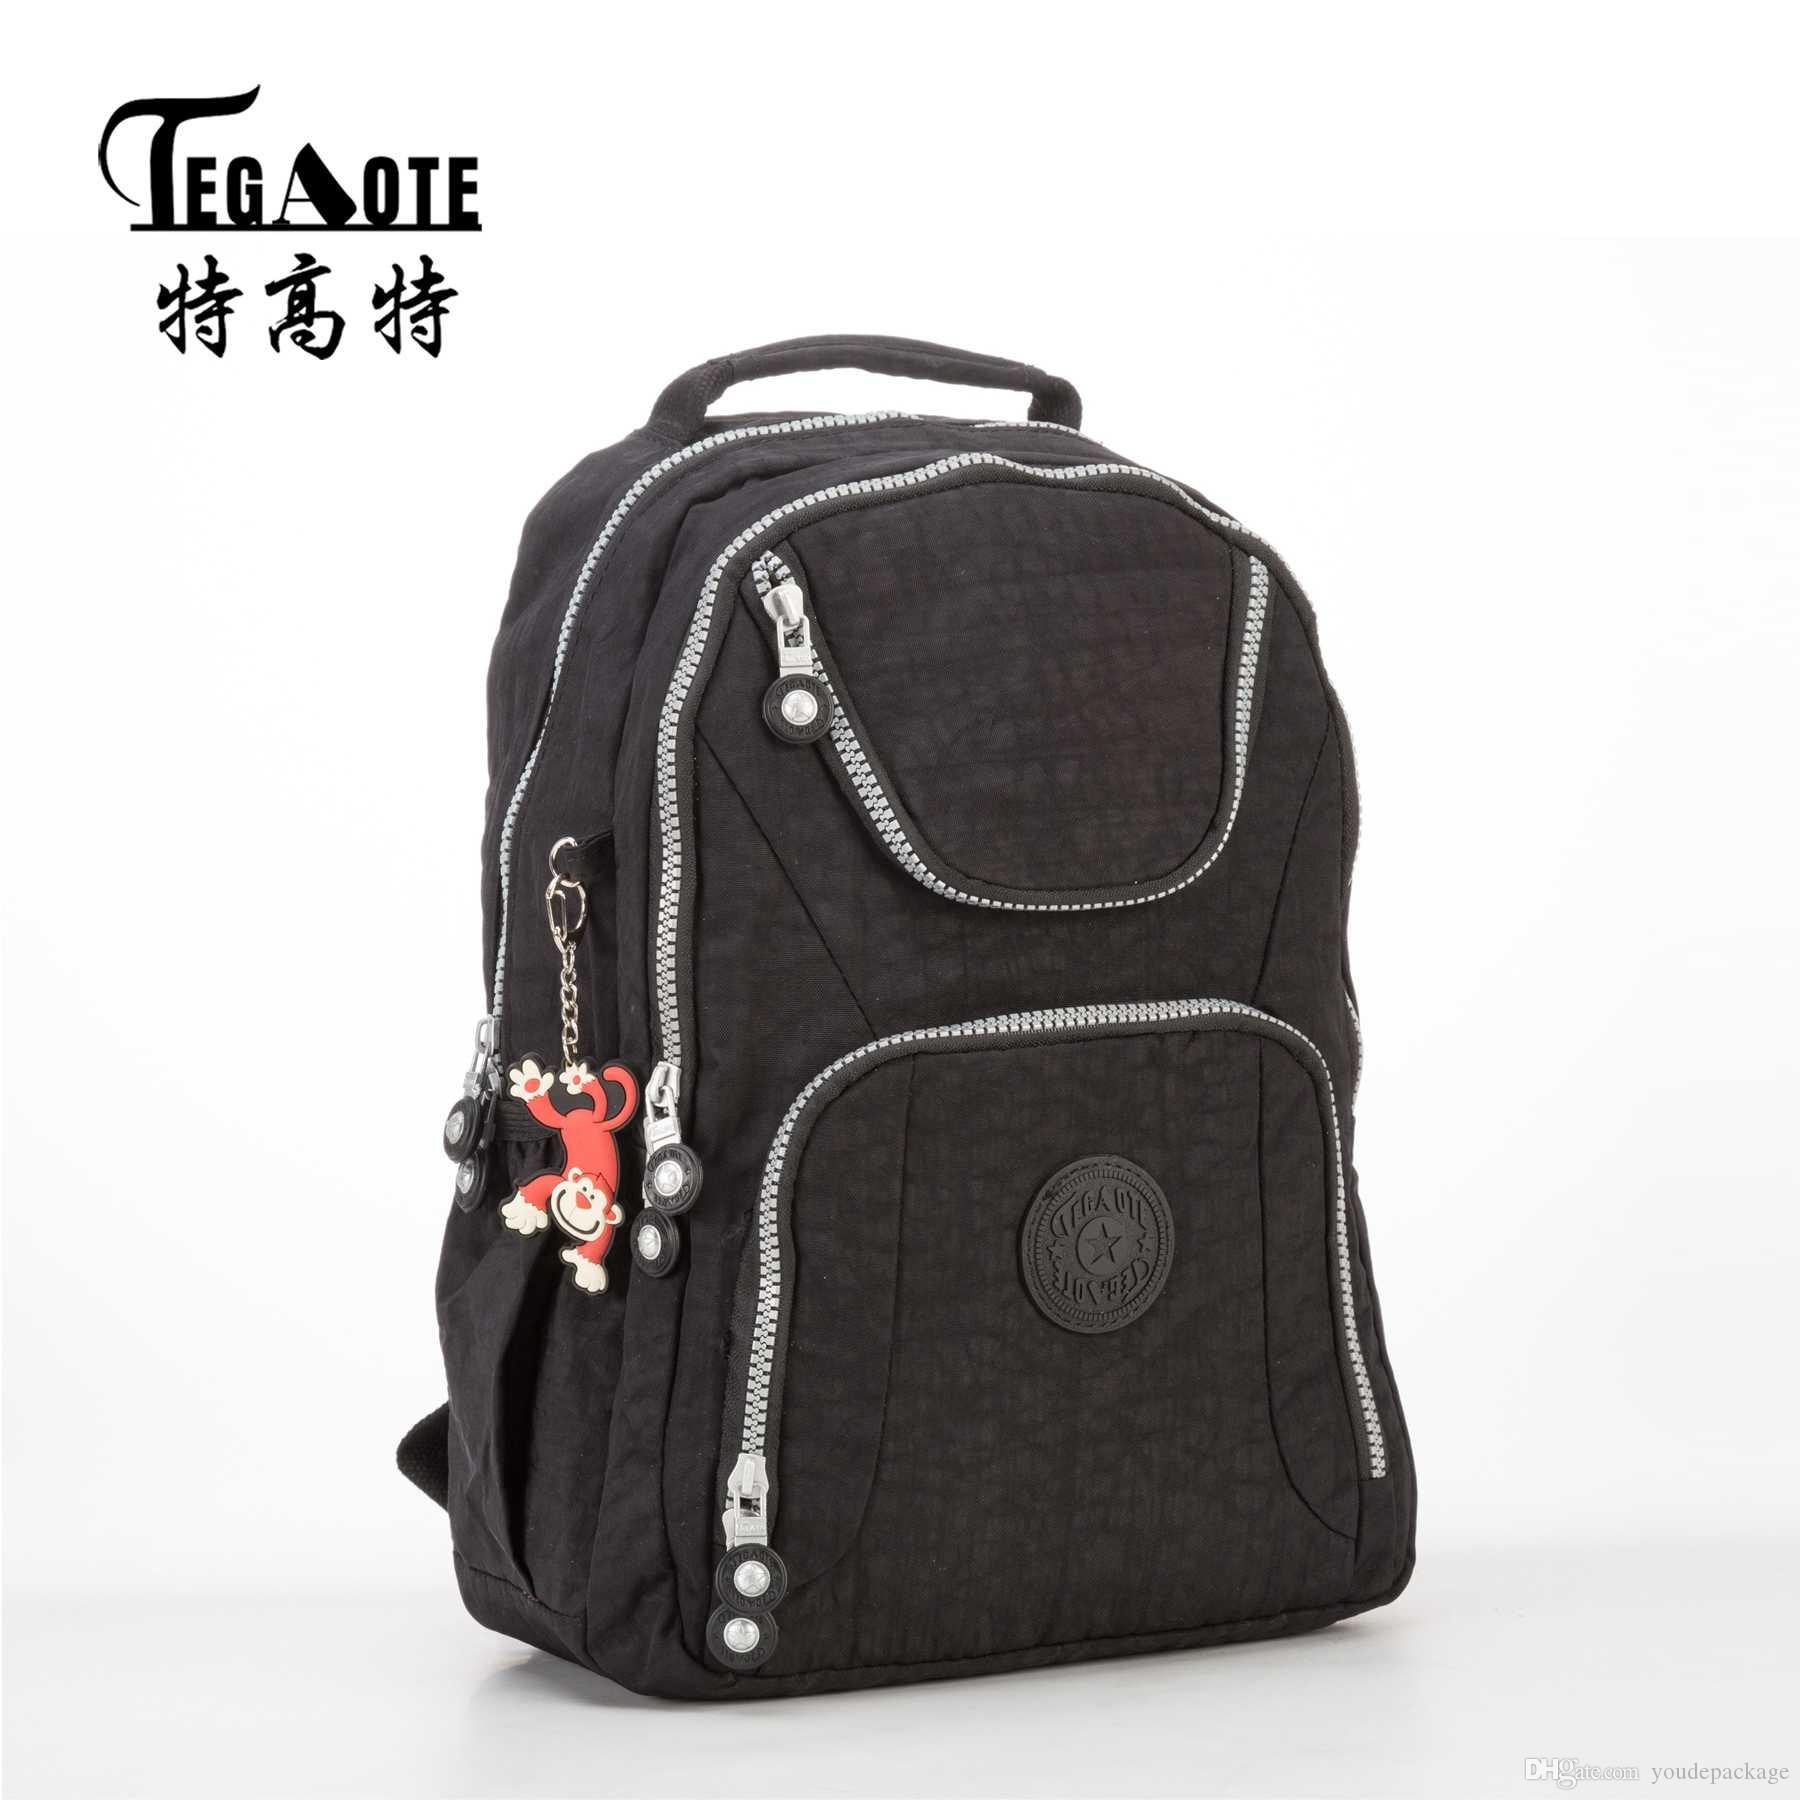 a3d66f8c64bf TEGAOTE 2017 Black Backpack Unisex Hombre Mochila Masculina Bookbag Nylon  Waterproof Male Bagpack Female Portatil Bag Sac A Dos Nylon Backpack  Classic Big ...